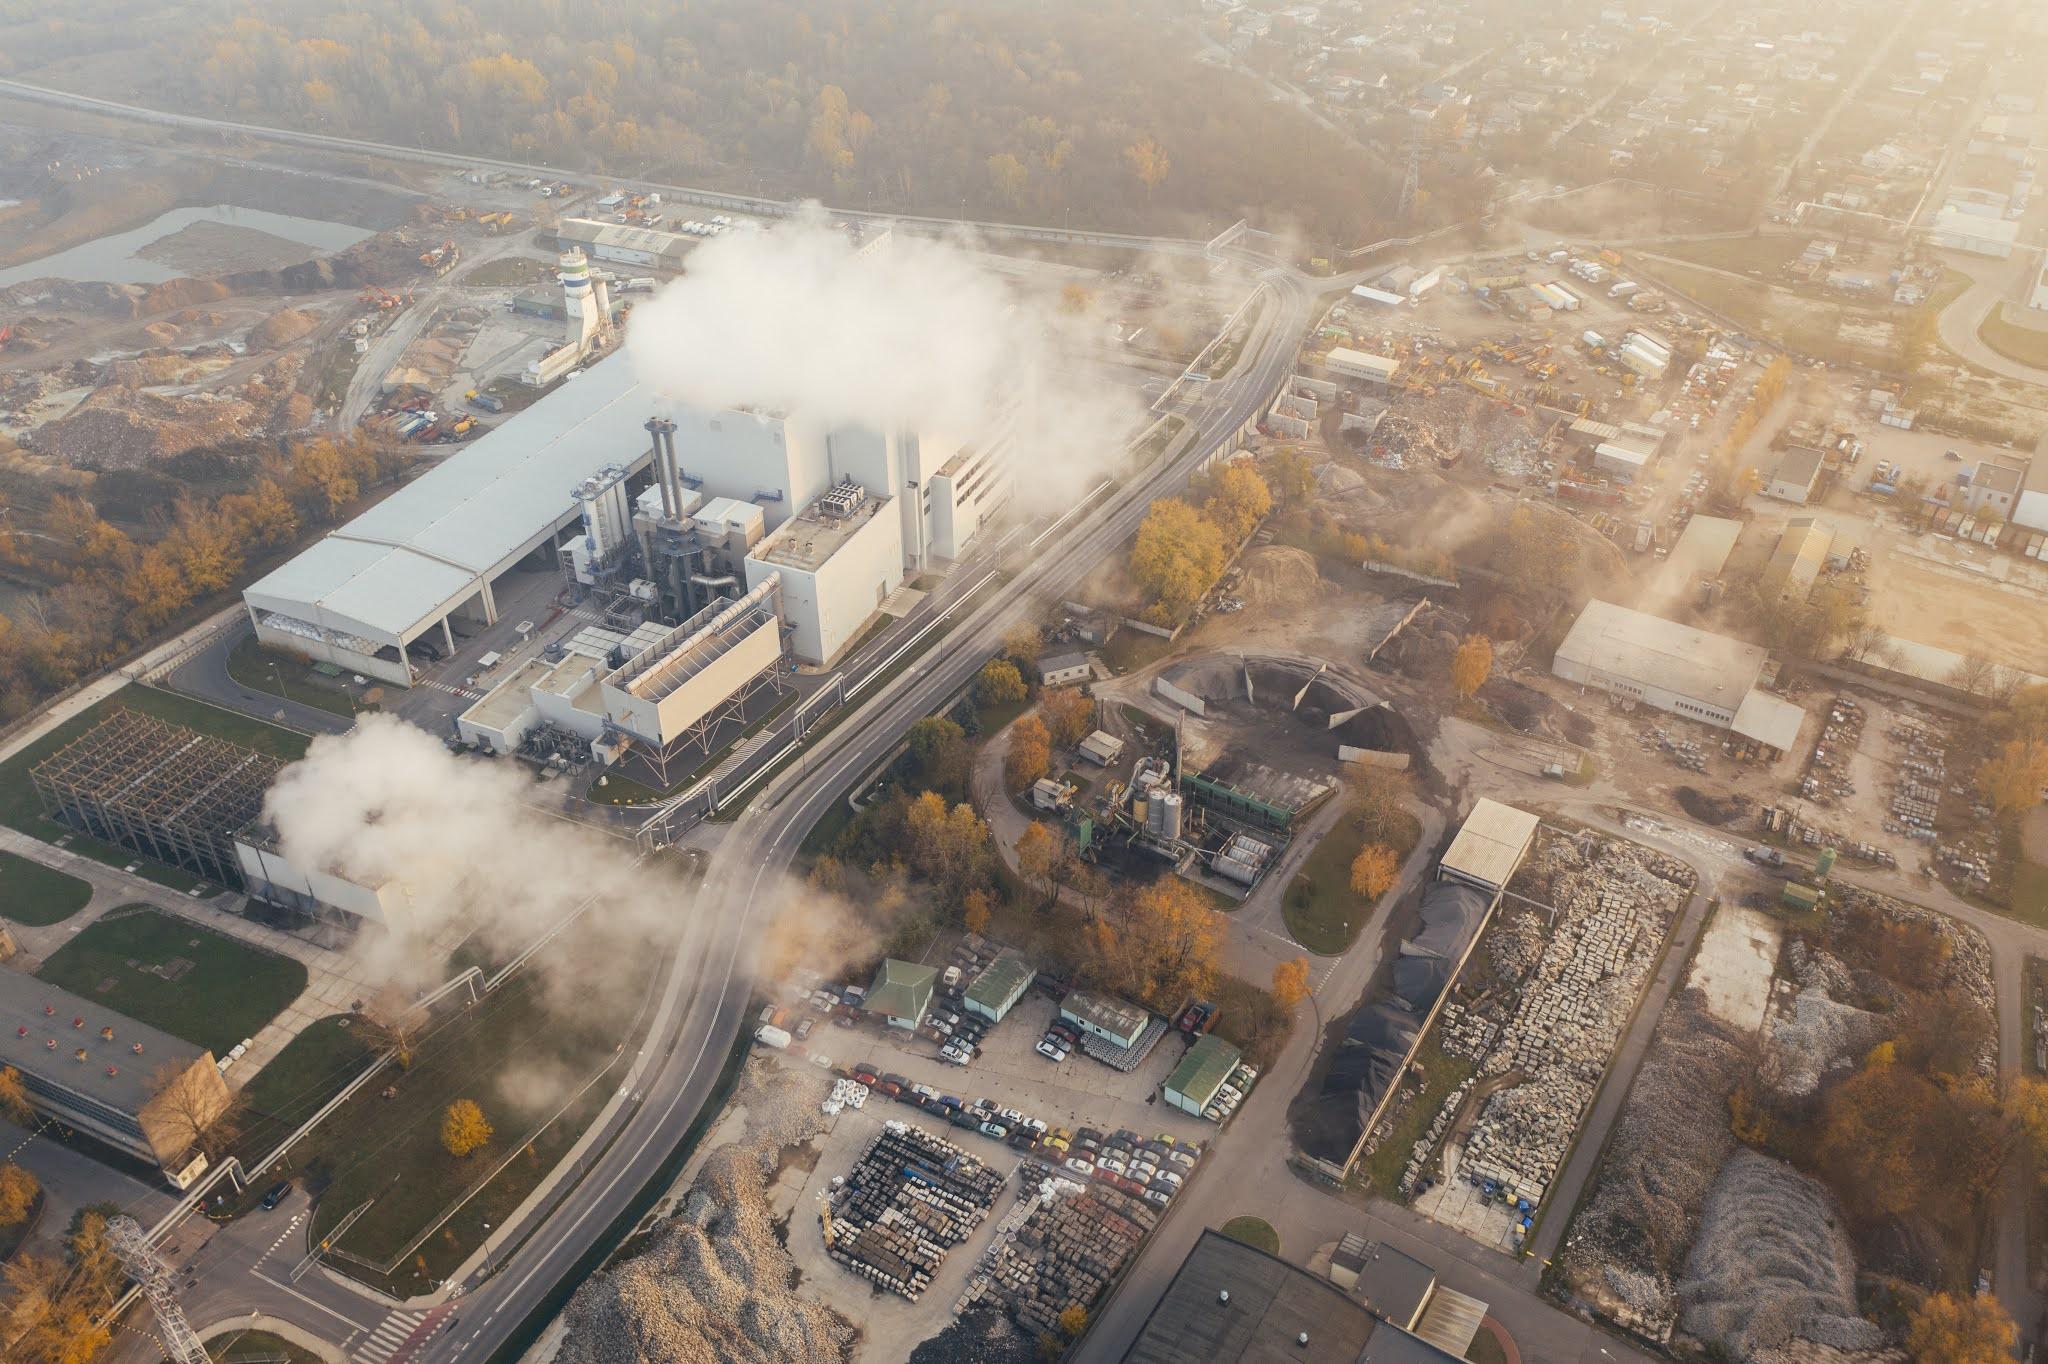 Emissões atmosféricas industriais